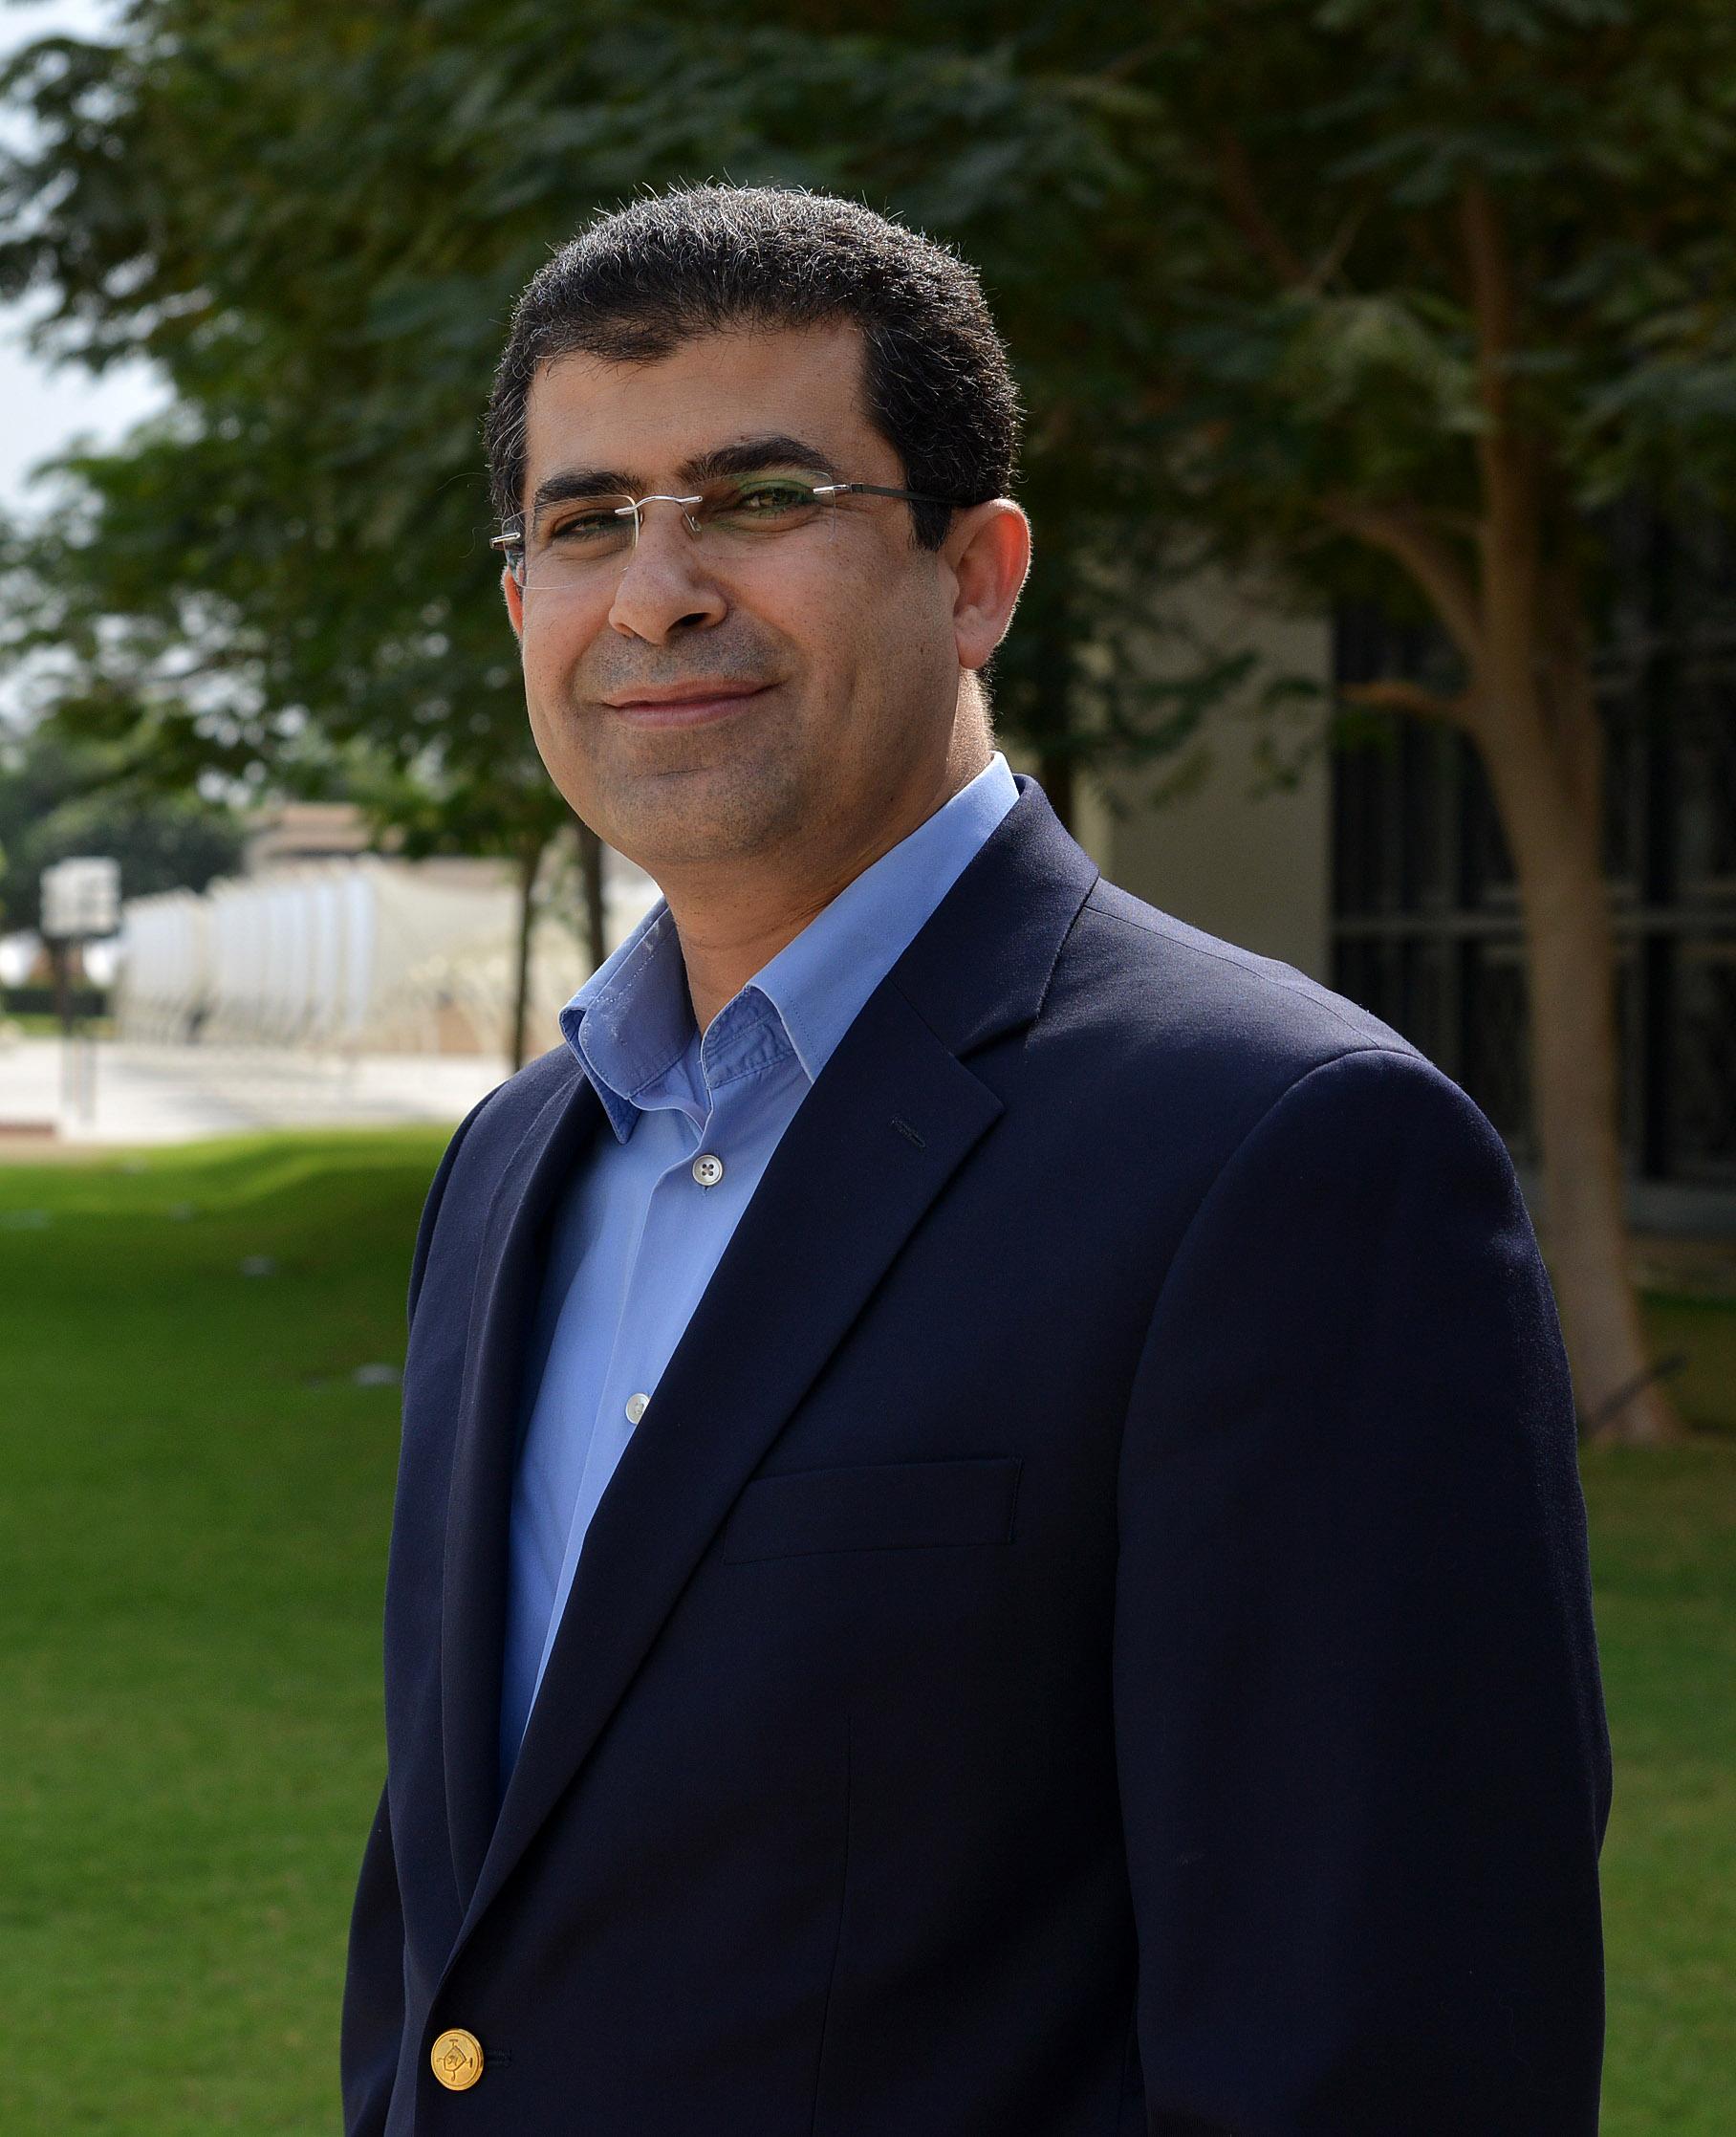 Dr. Riyadh Al-Raoush